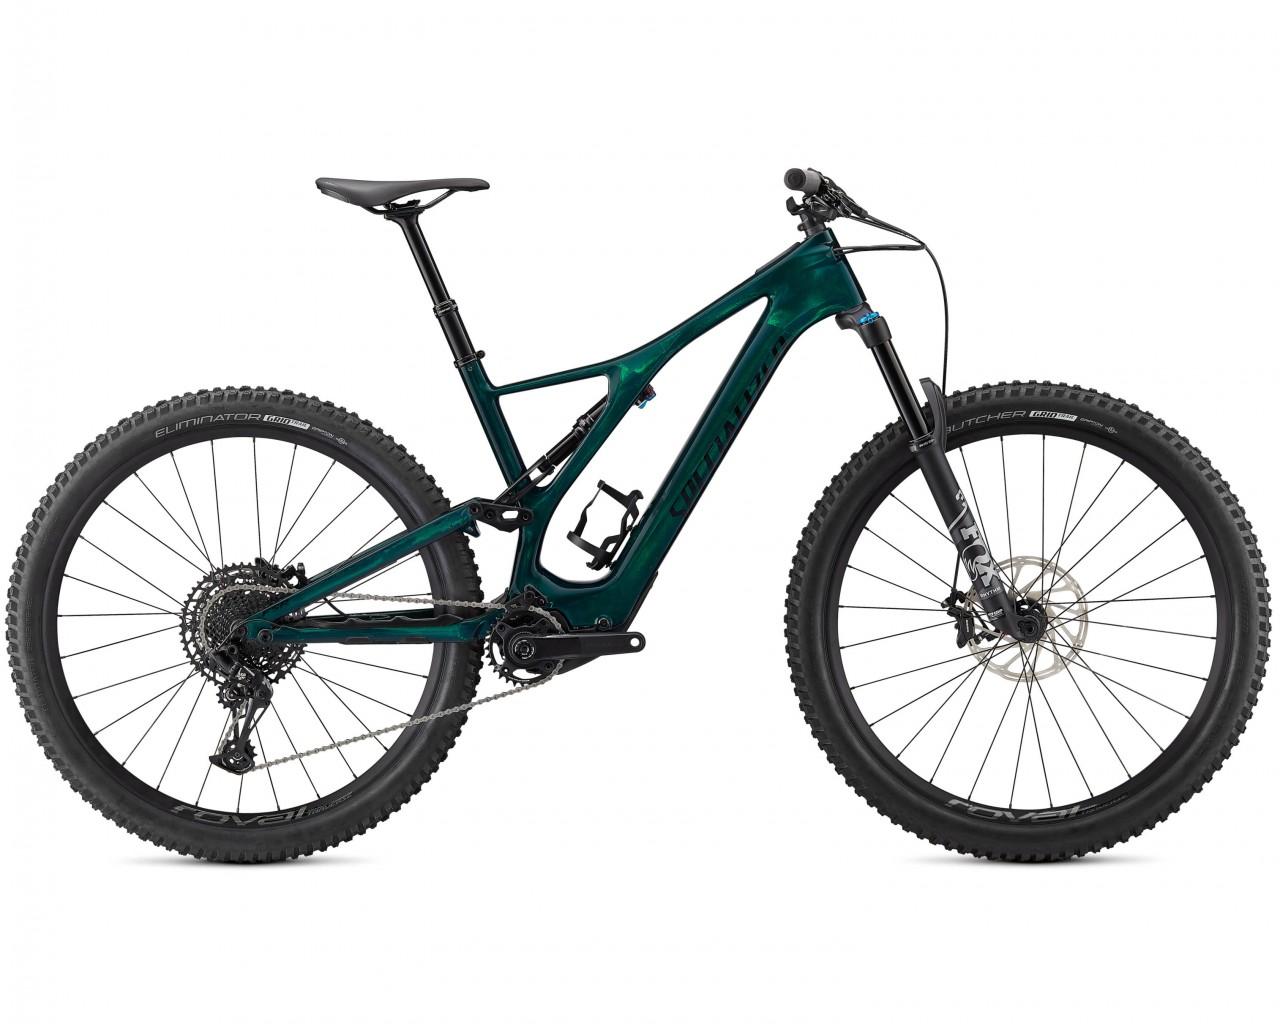 Specialized Levo SL Comp Carbon 29 - Pedelec Carbon Mountain Bike Fullsuspension 2021   green tint-black